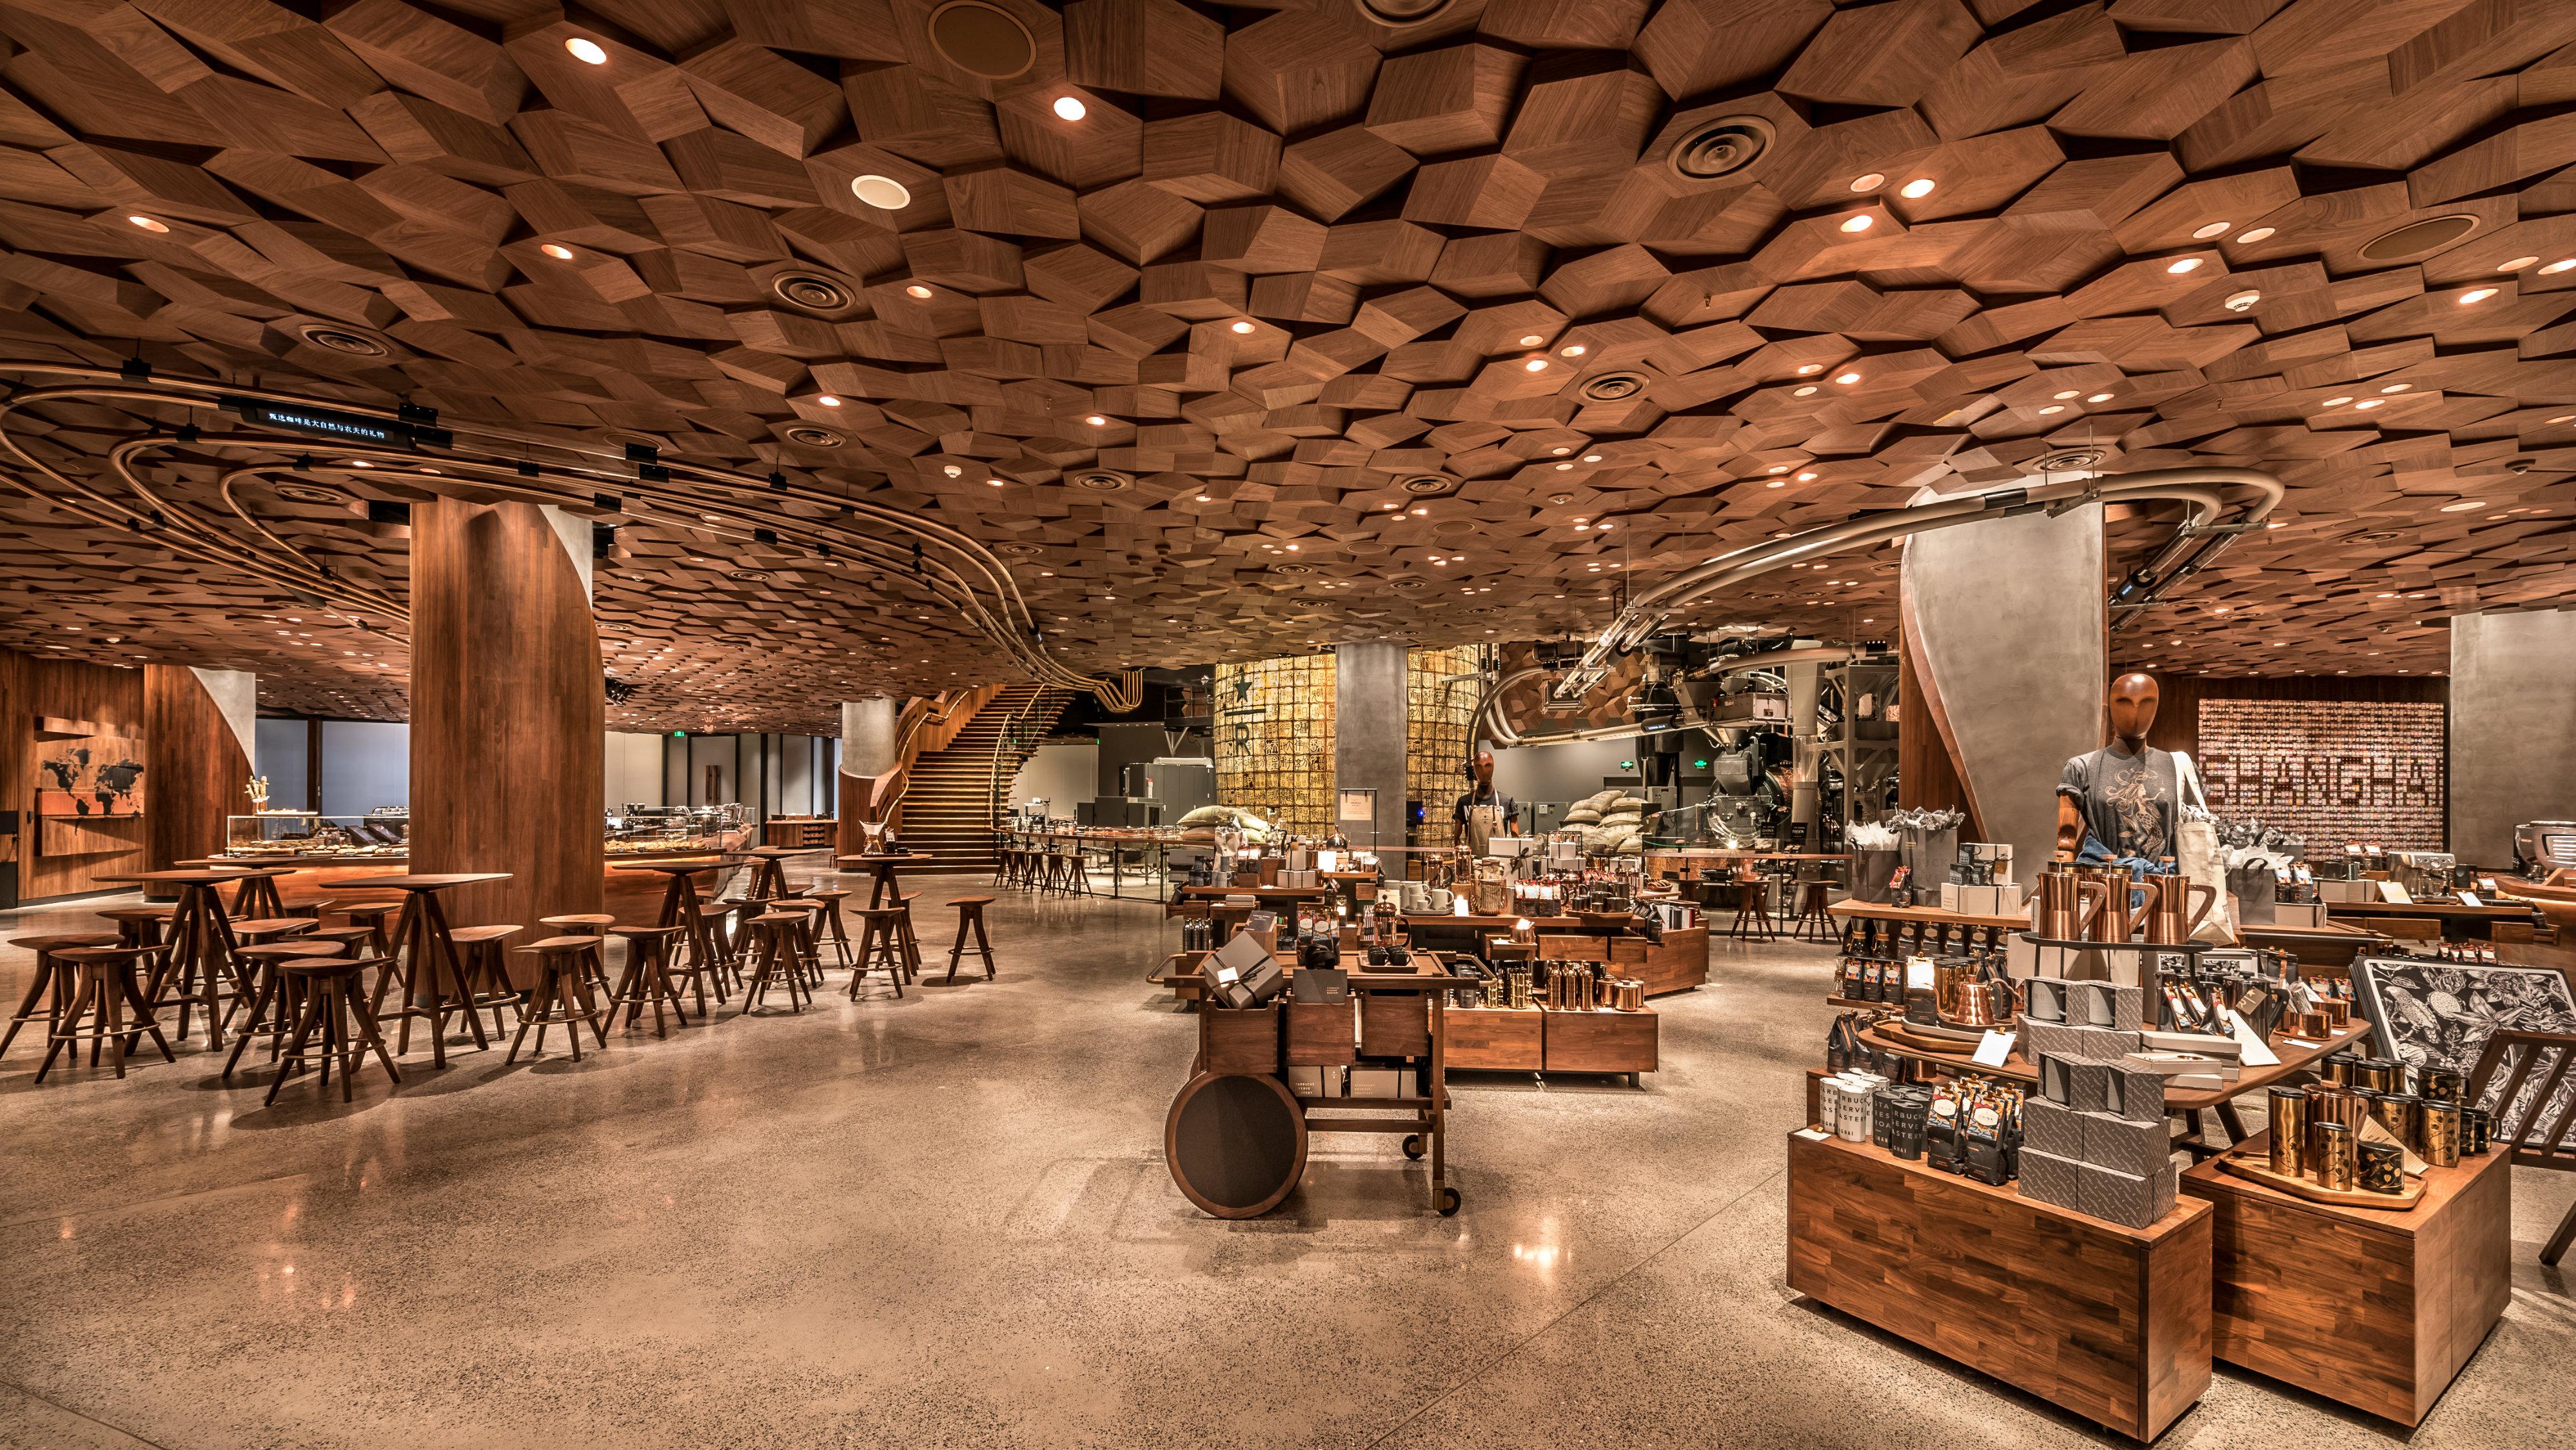 The new Starbucks Roastery in Shanghai, China.